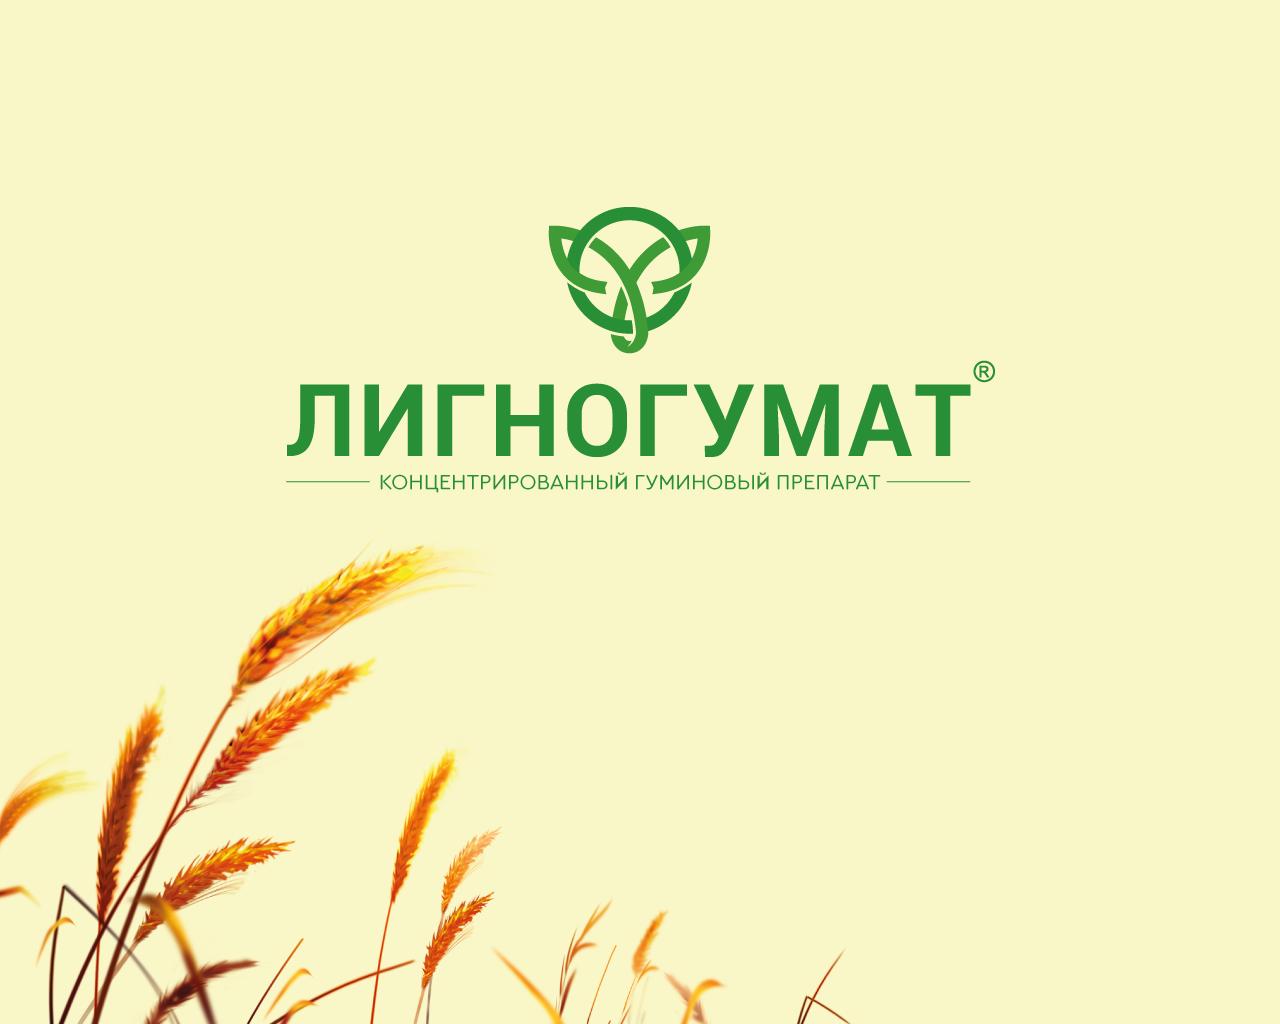 Логотип и фирменный стиль фото f_66159510fcc0a8de.png